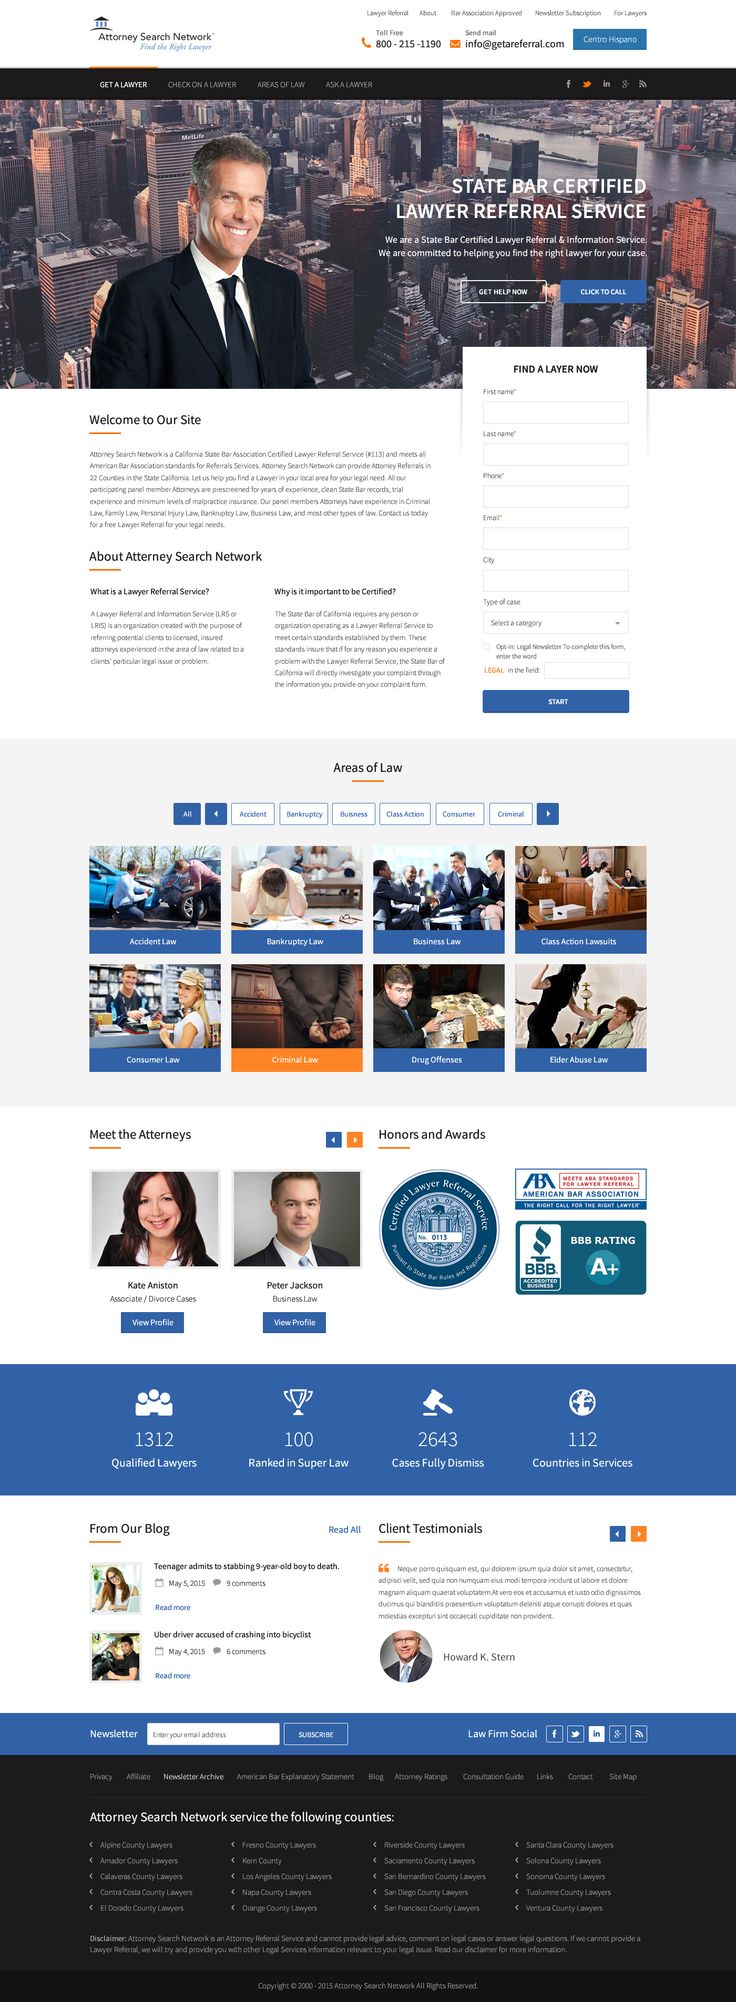 Website Design fr Attorney Search Network